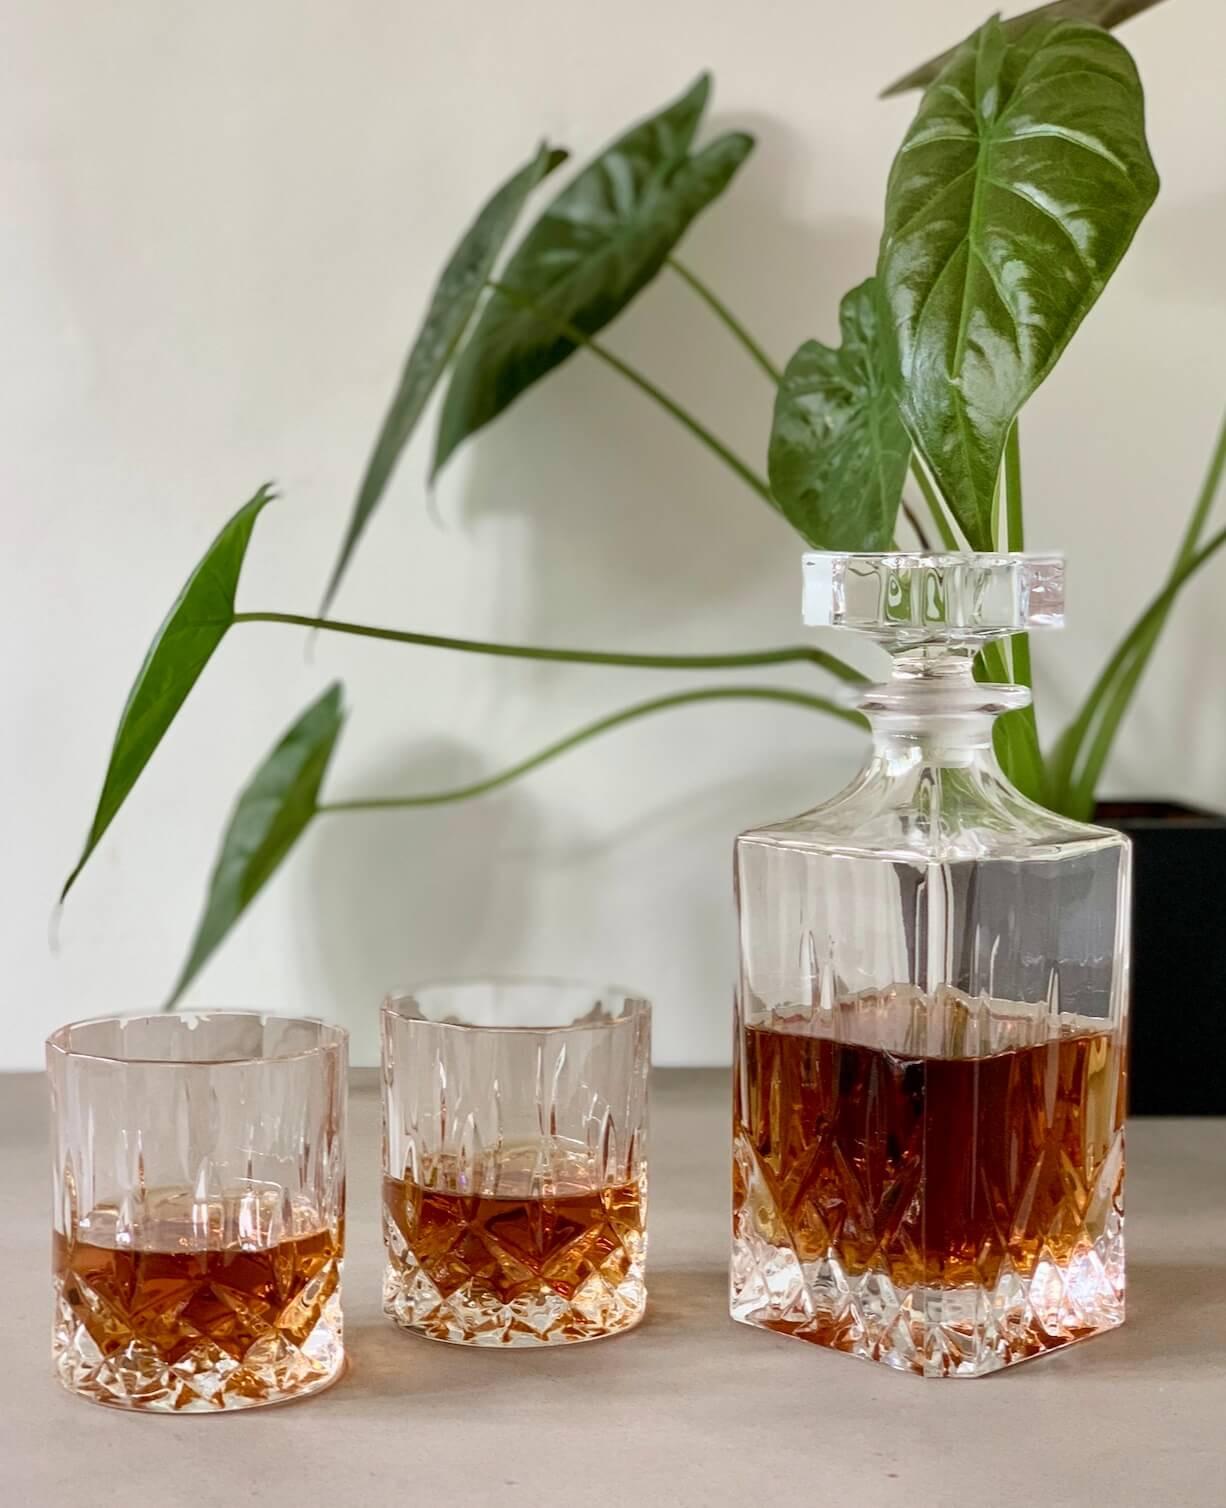 Rcr-Opera-Decanter-dekanter-karaffel-krystalglas-whiskey-whisky-morgenjuice-likør-kvadratisk-maskulin-lowball-DOF-Whiskey-Whisky-tumbler-mixmeister.dk